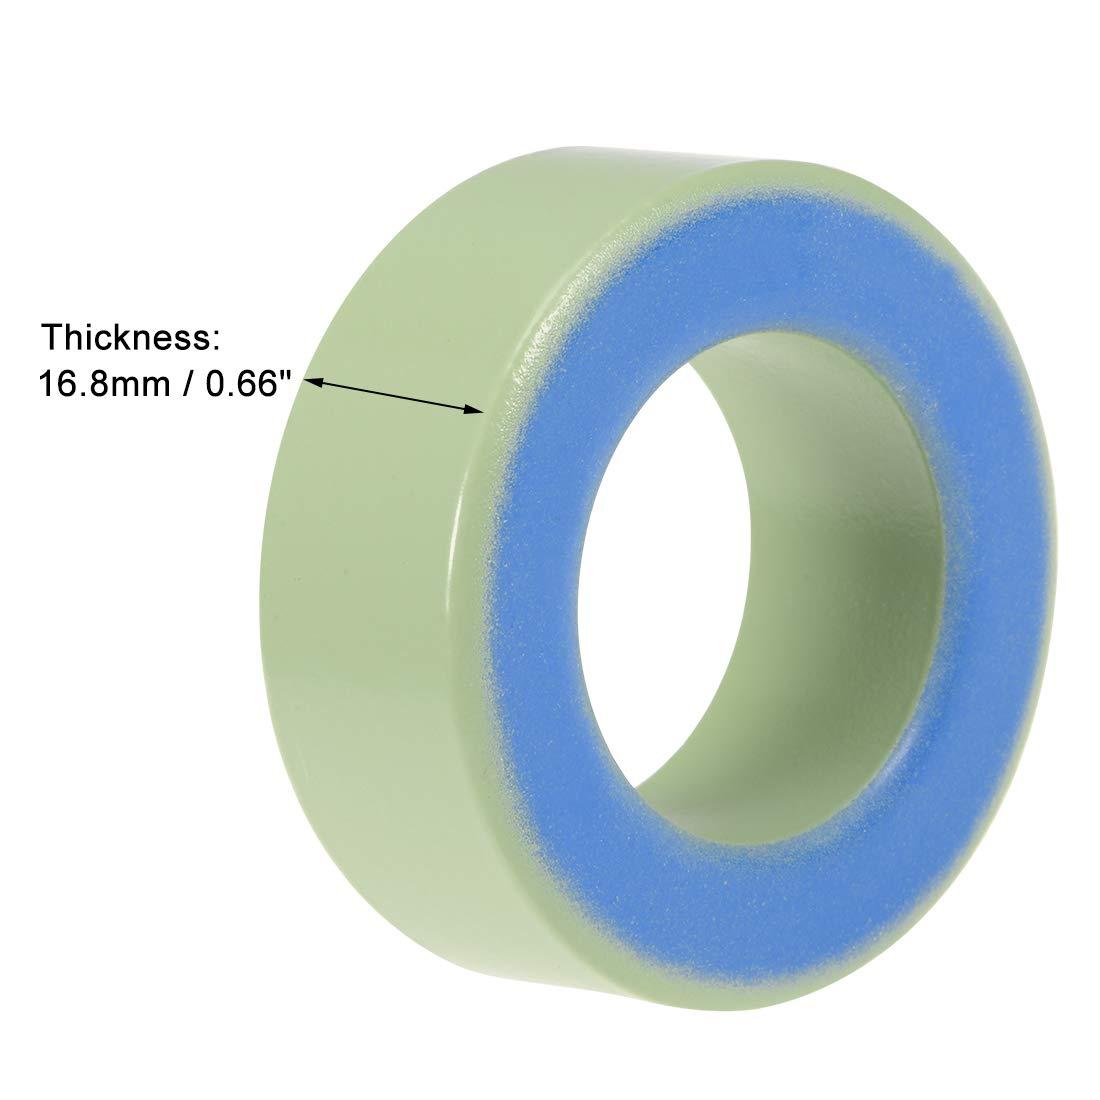 14 x 27.3 x 14.8mm Ferrite Chokes Ring Iron Powder Inductor Ferrite Rings Yellow White 10pcs sourcing map Toroid Core